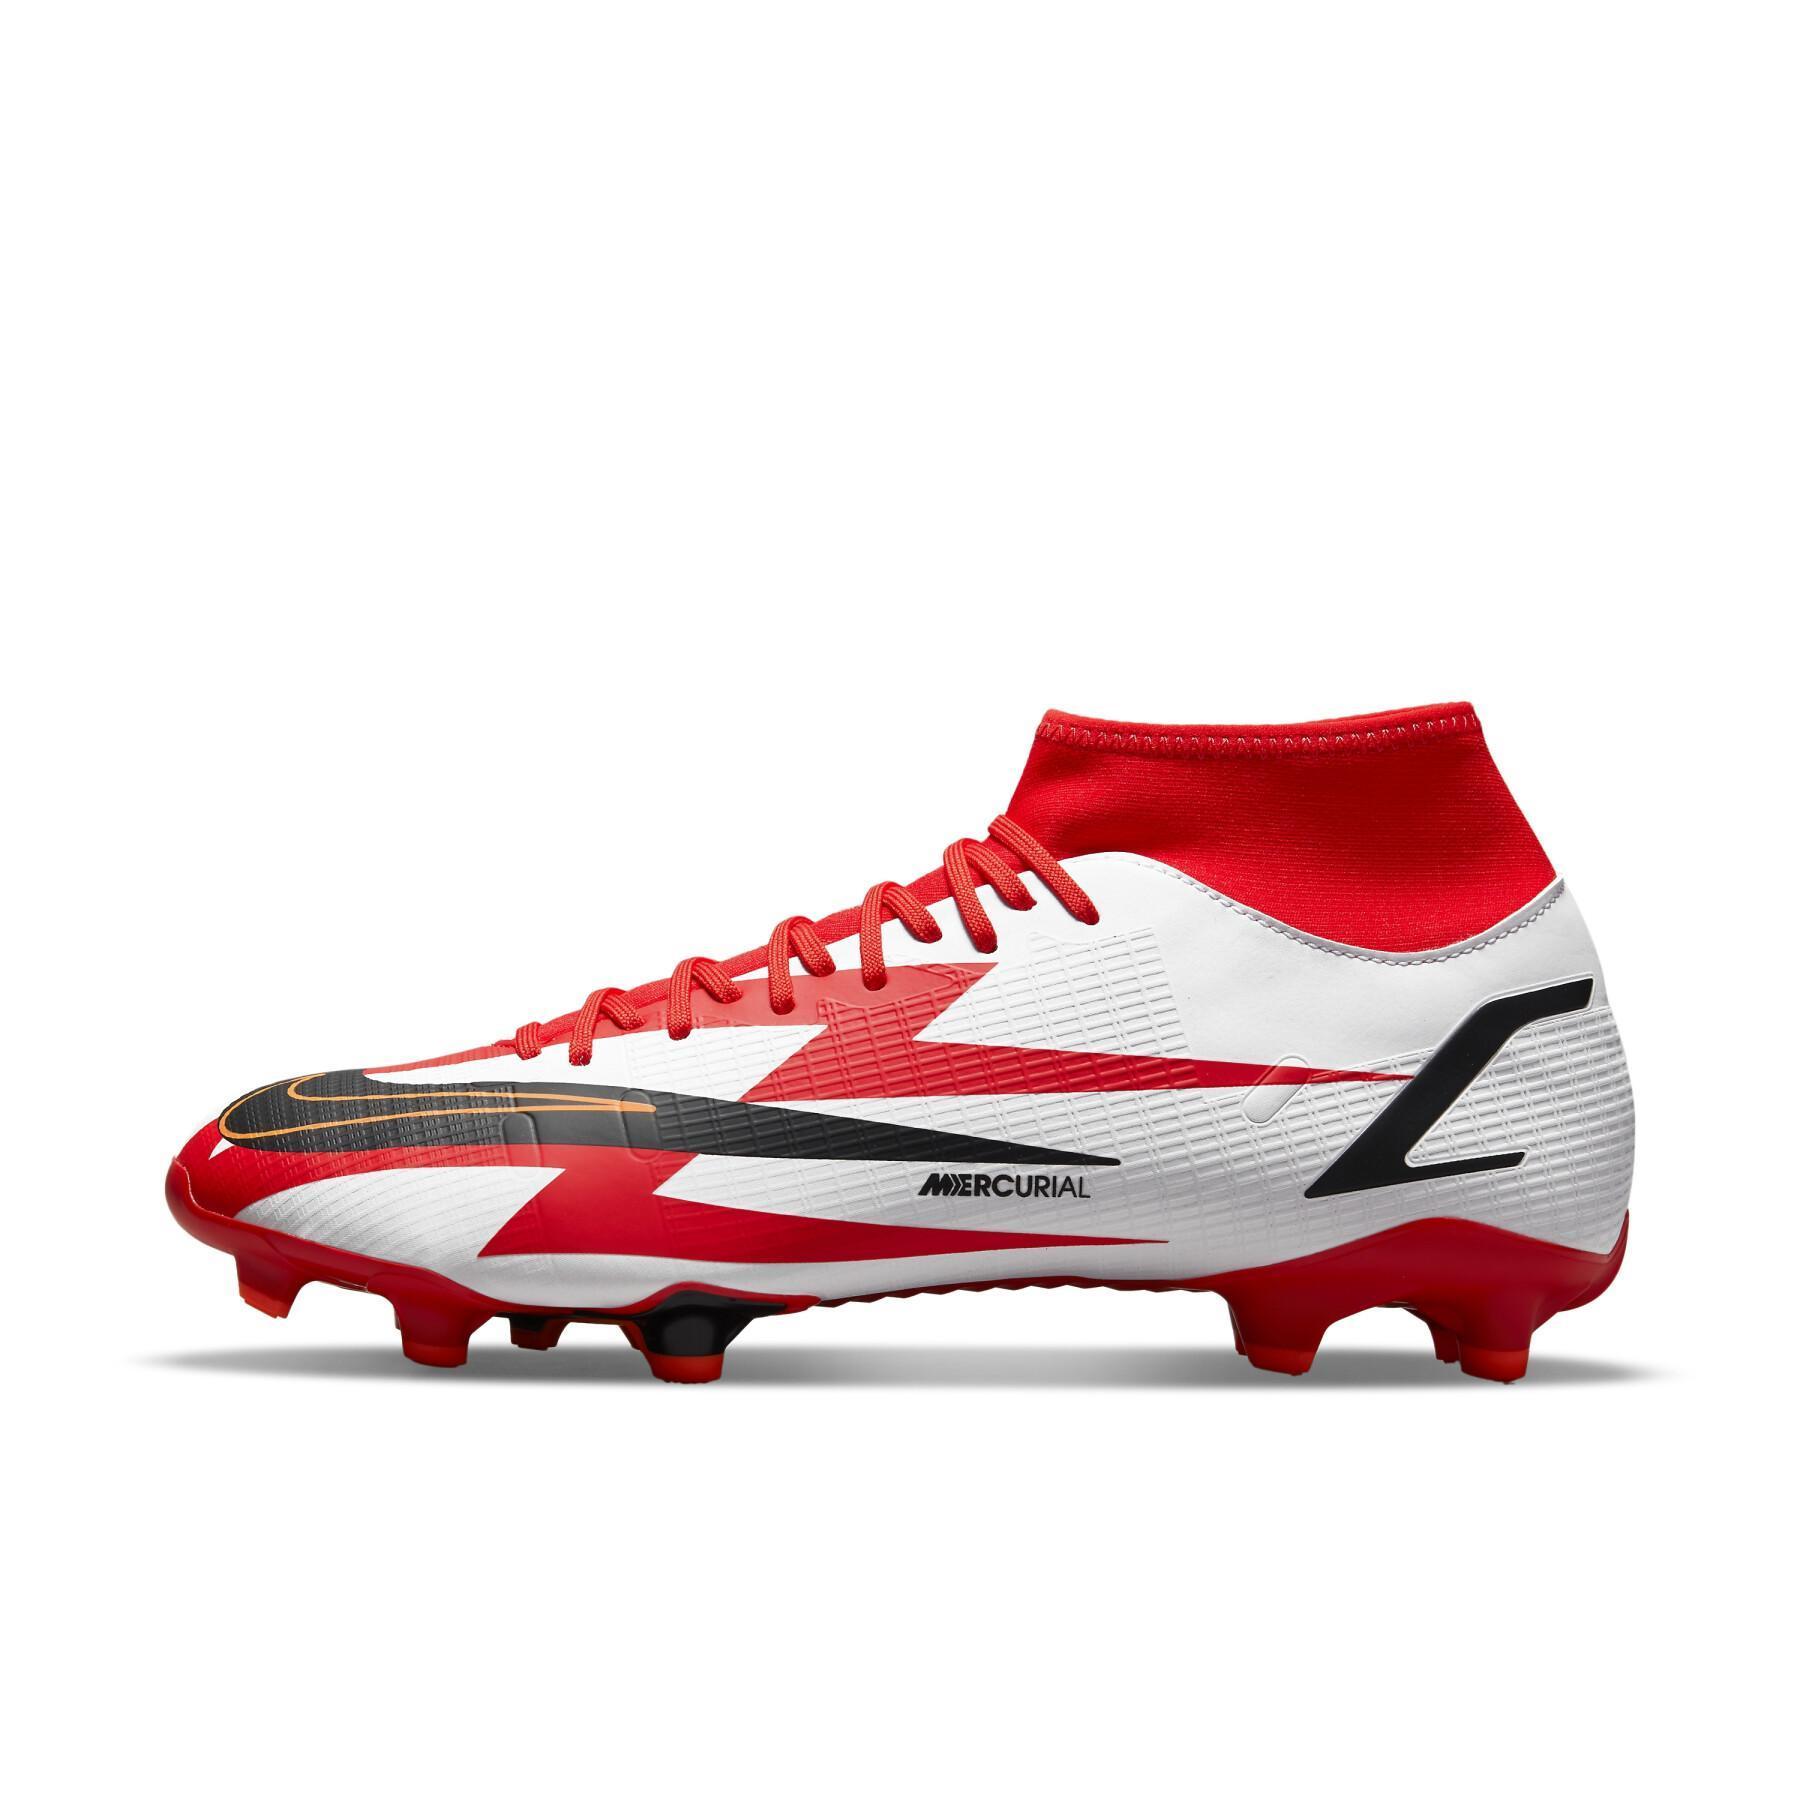 Schoenen Nike Mercurial Superfly 8 Academy CR7 MG